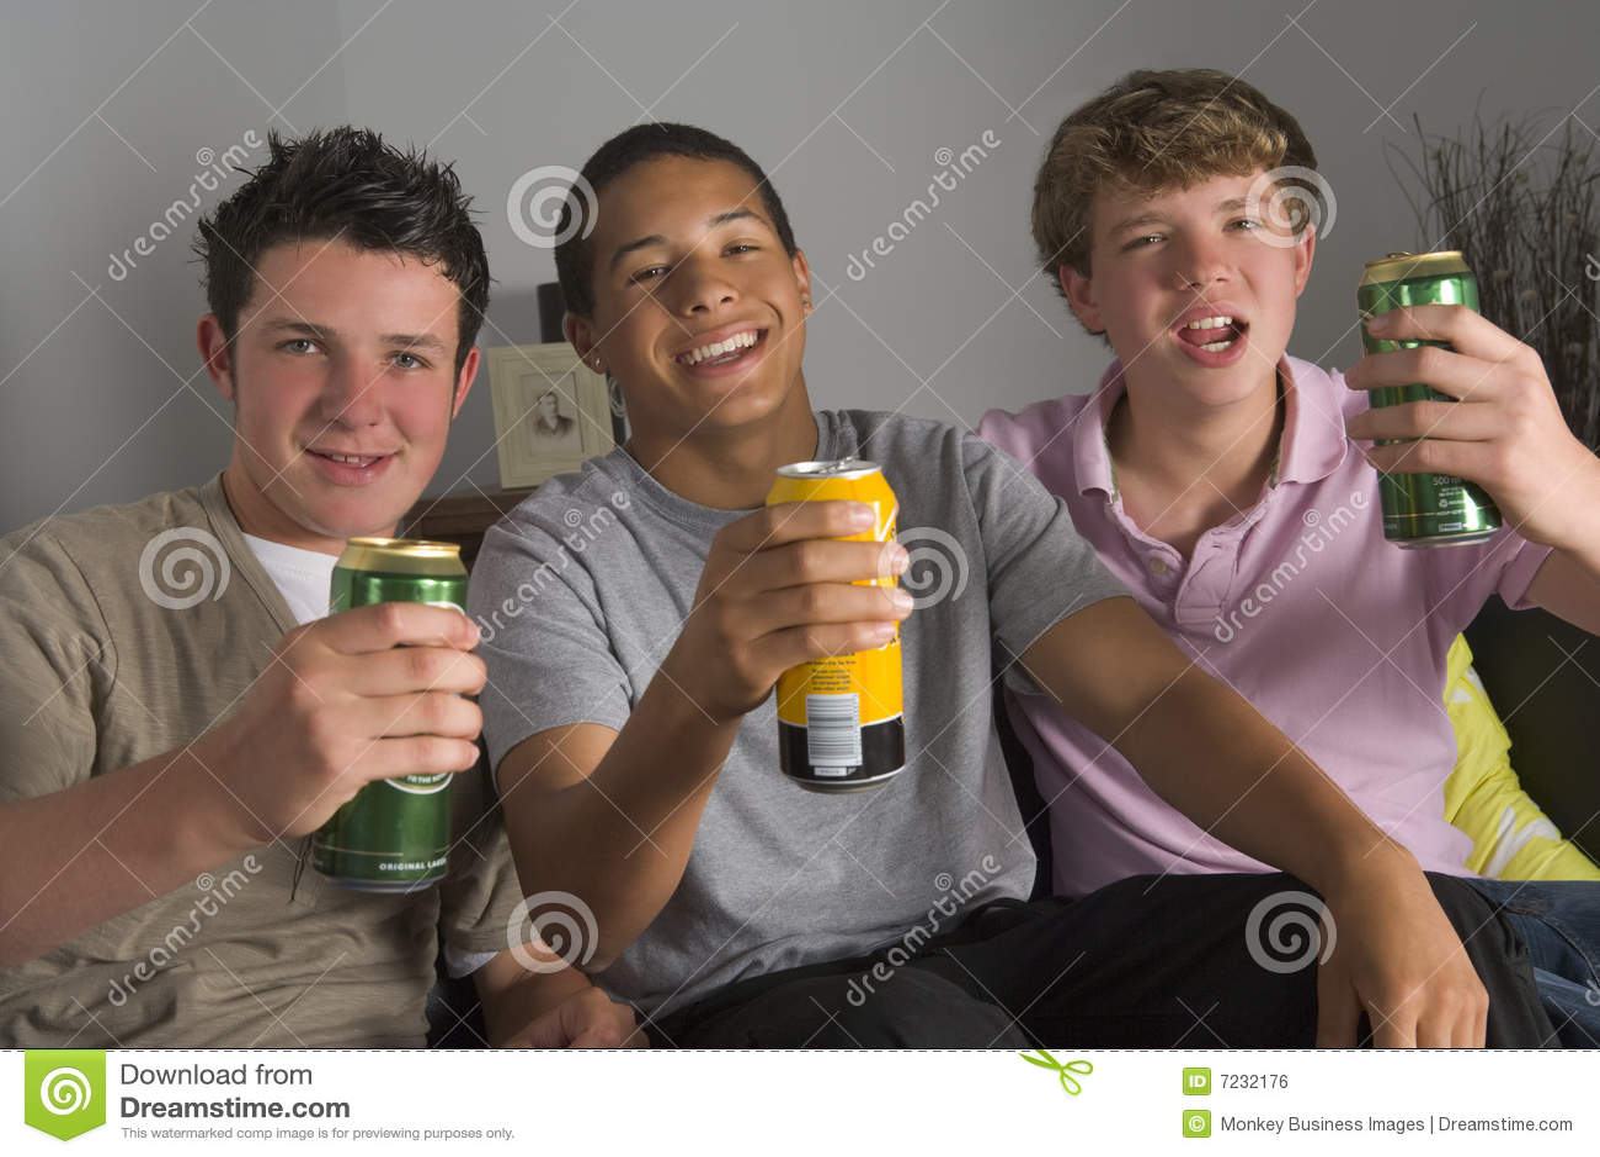 Teenage Boys Drinking Beer Royalty Free Stock Image